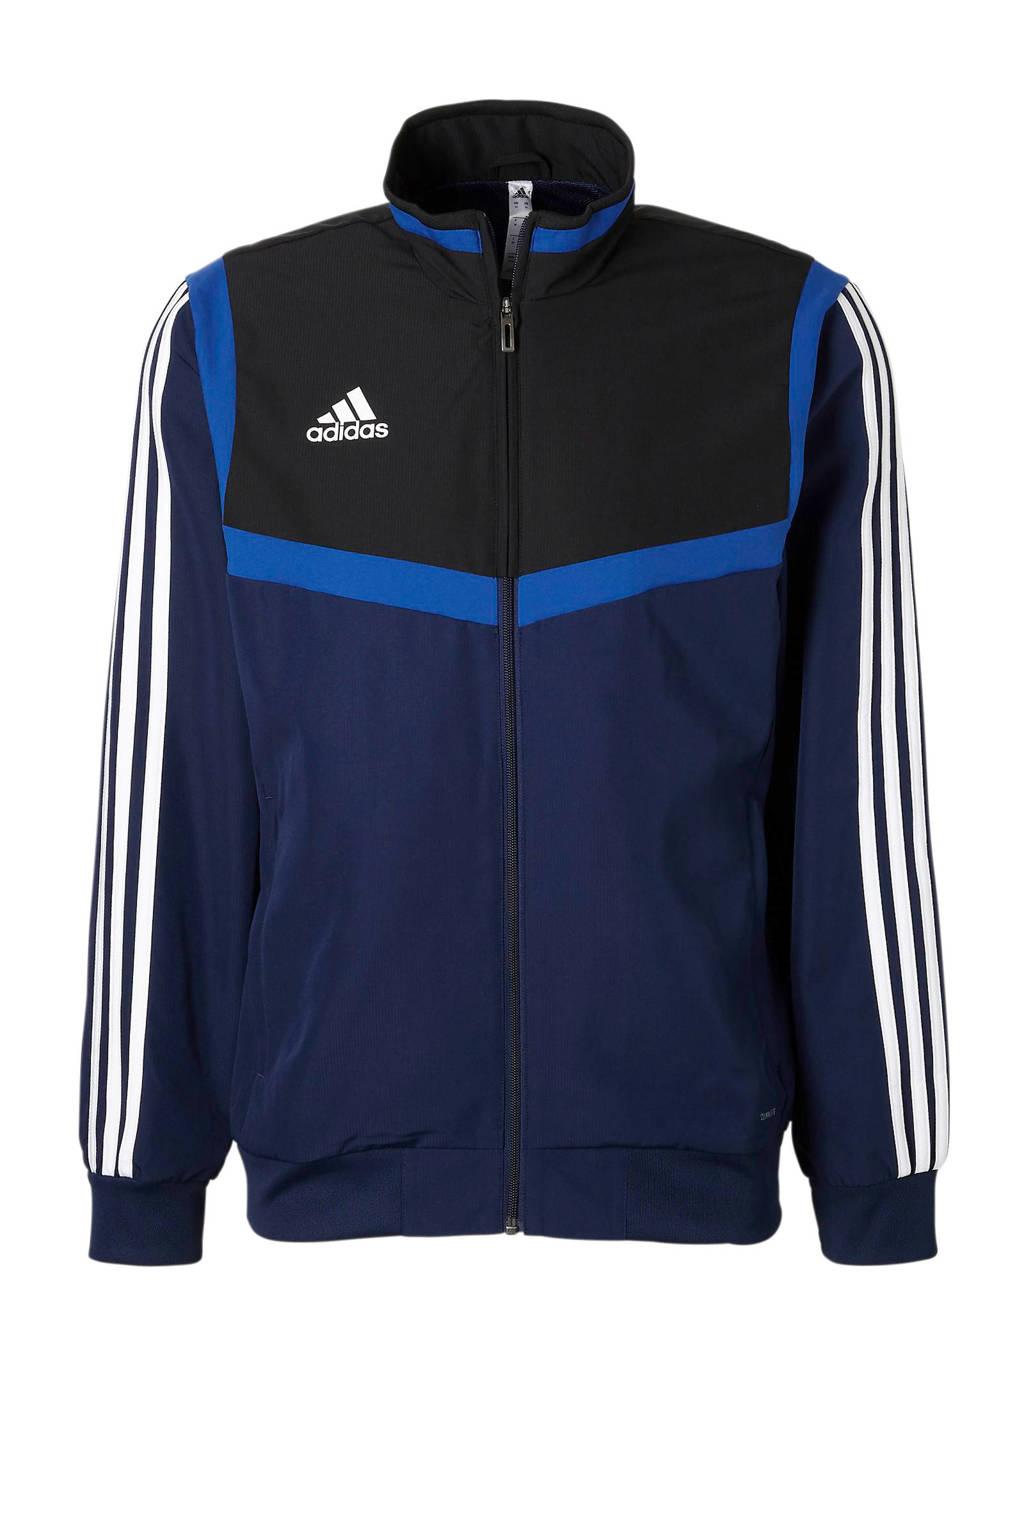 adidas performance   sportvest donkerblauw, Donkerblauw/zwart/blauw/wit